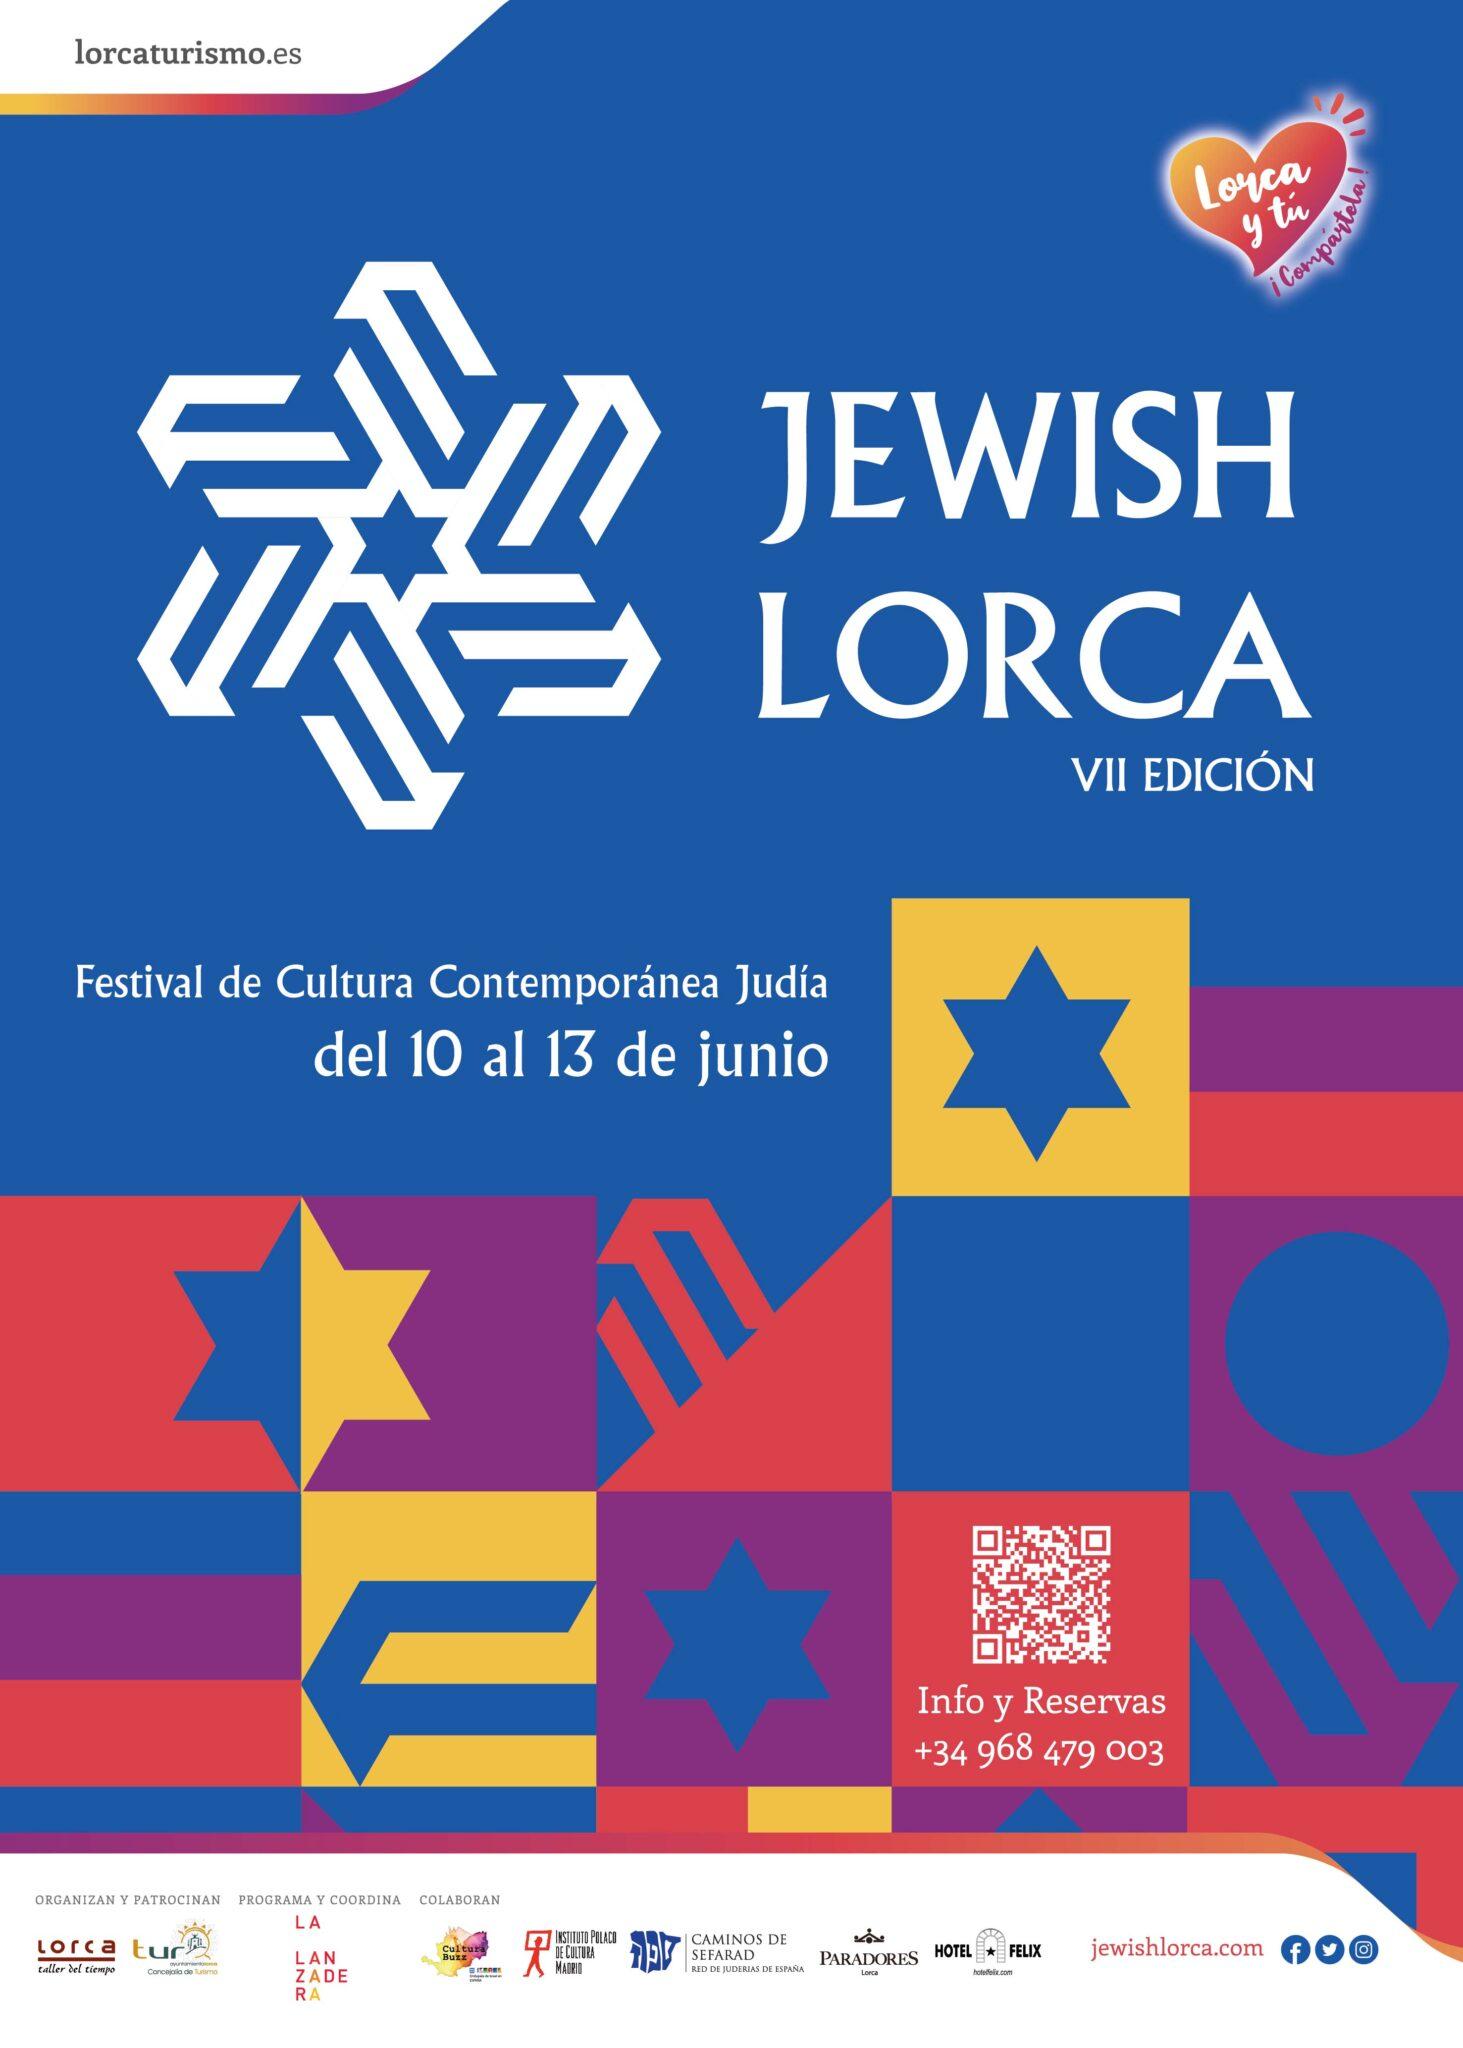 lorca-festival